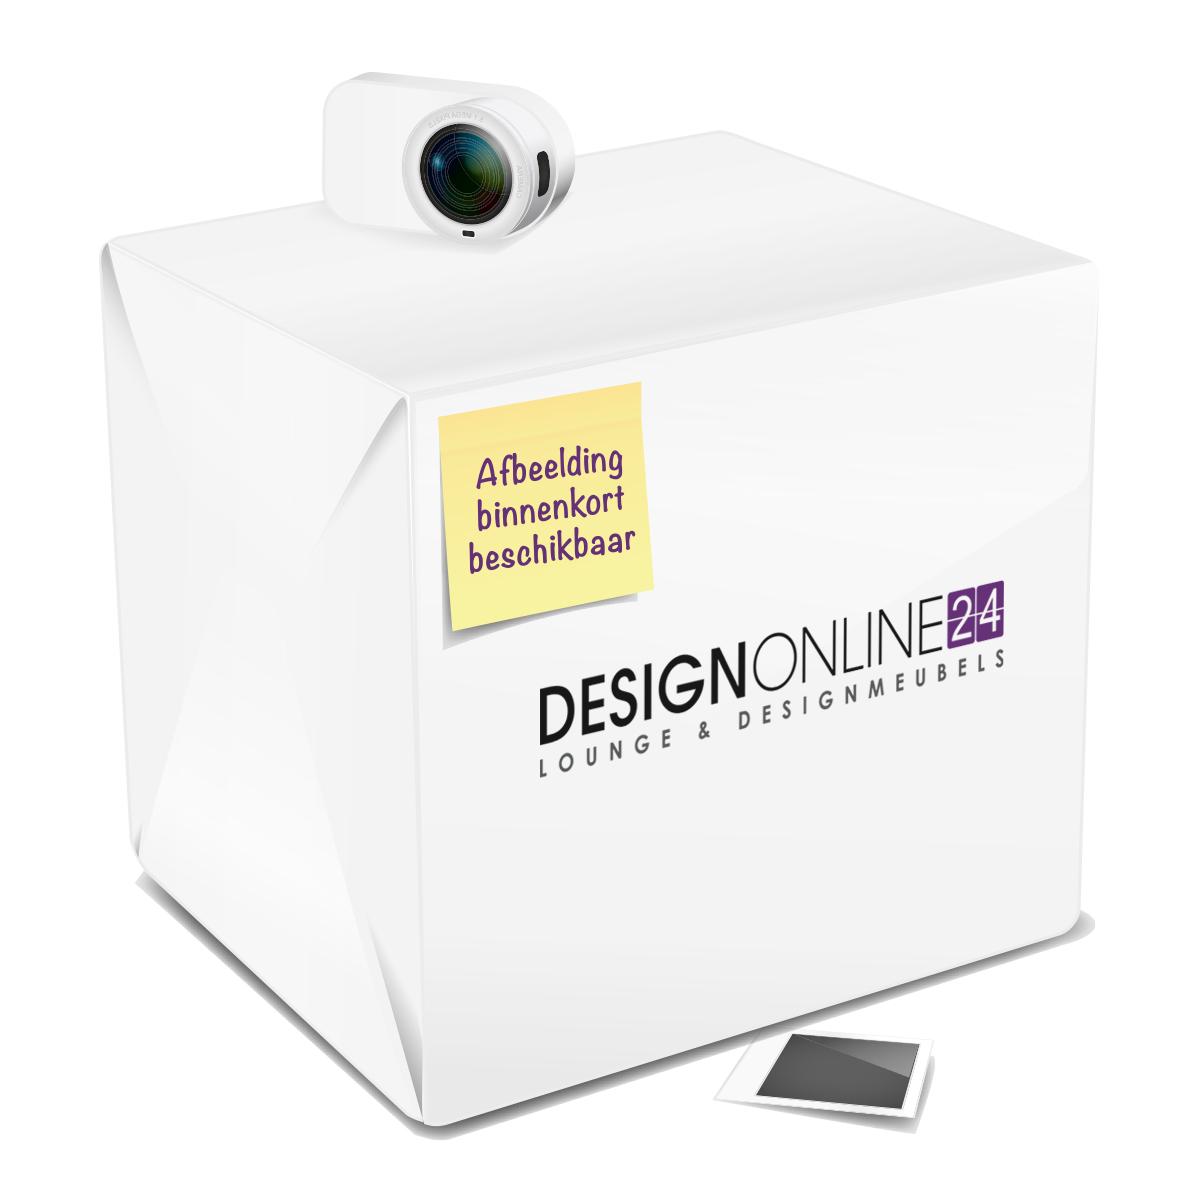 d-Bodhi Fendy Locker Kast - 9 Deurs - L120 x B40 x H160 cm - Teakhout + Gratis Design Tafellamp twv € 79,95